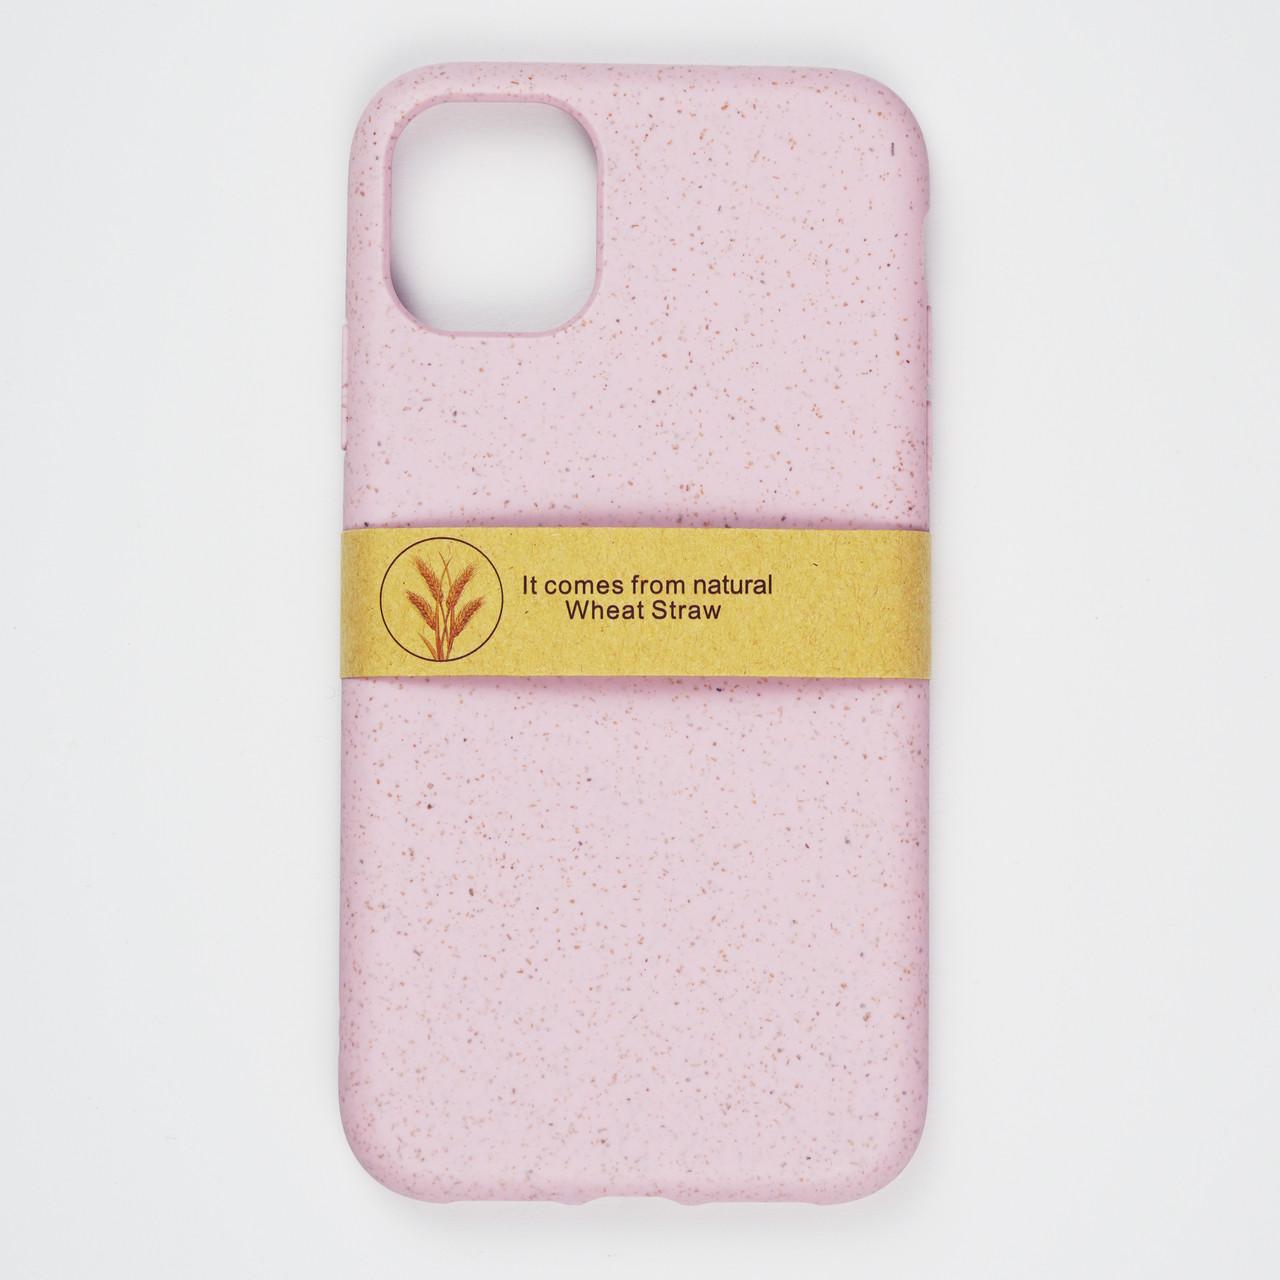 Биоразлагаемый чехол ECO Wheat Straw для iPhone 11 Pro Pink